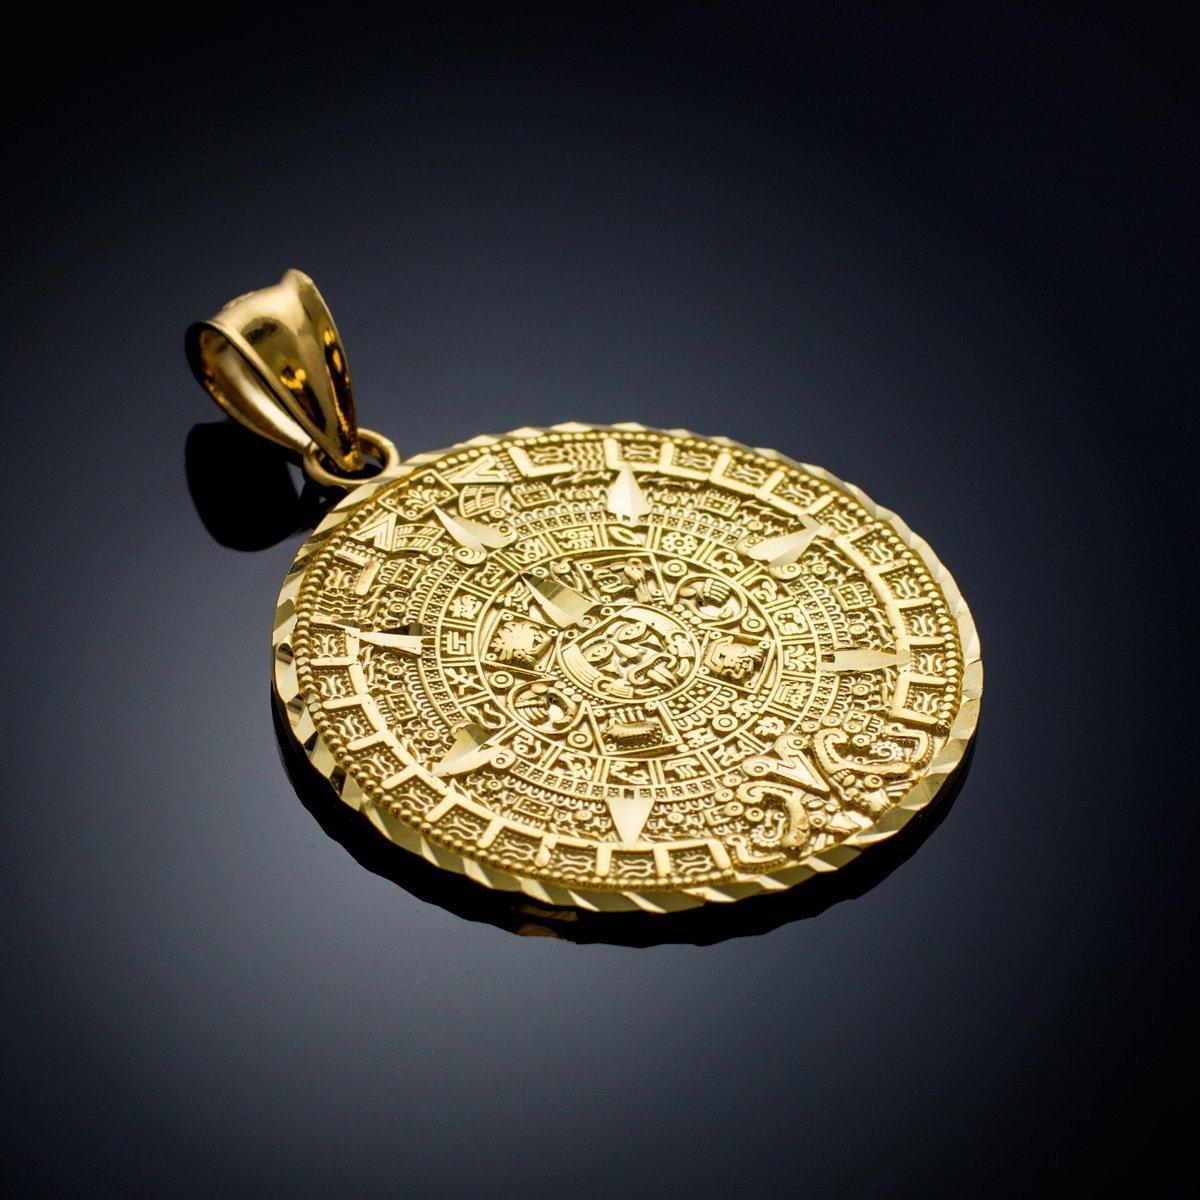 Amazoncom 14k Yellow Gold Aztec Charm Mayan Calendar Pendant 254